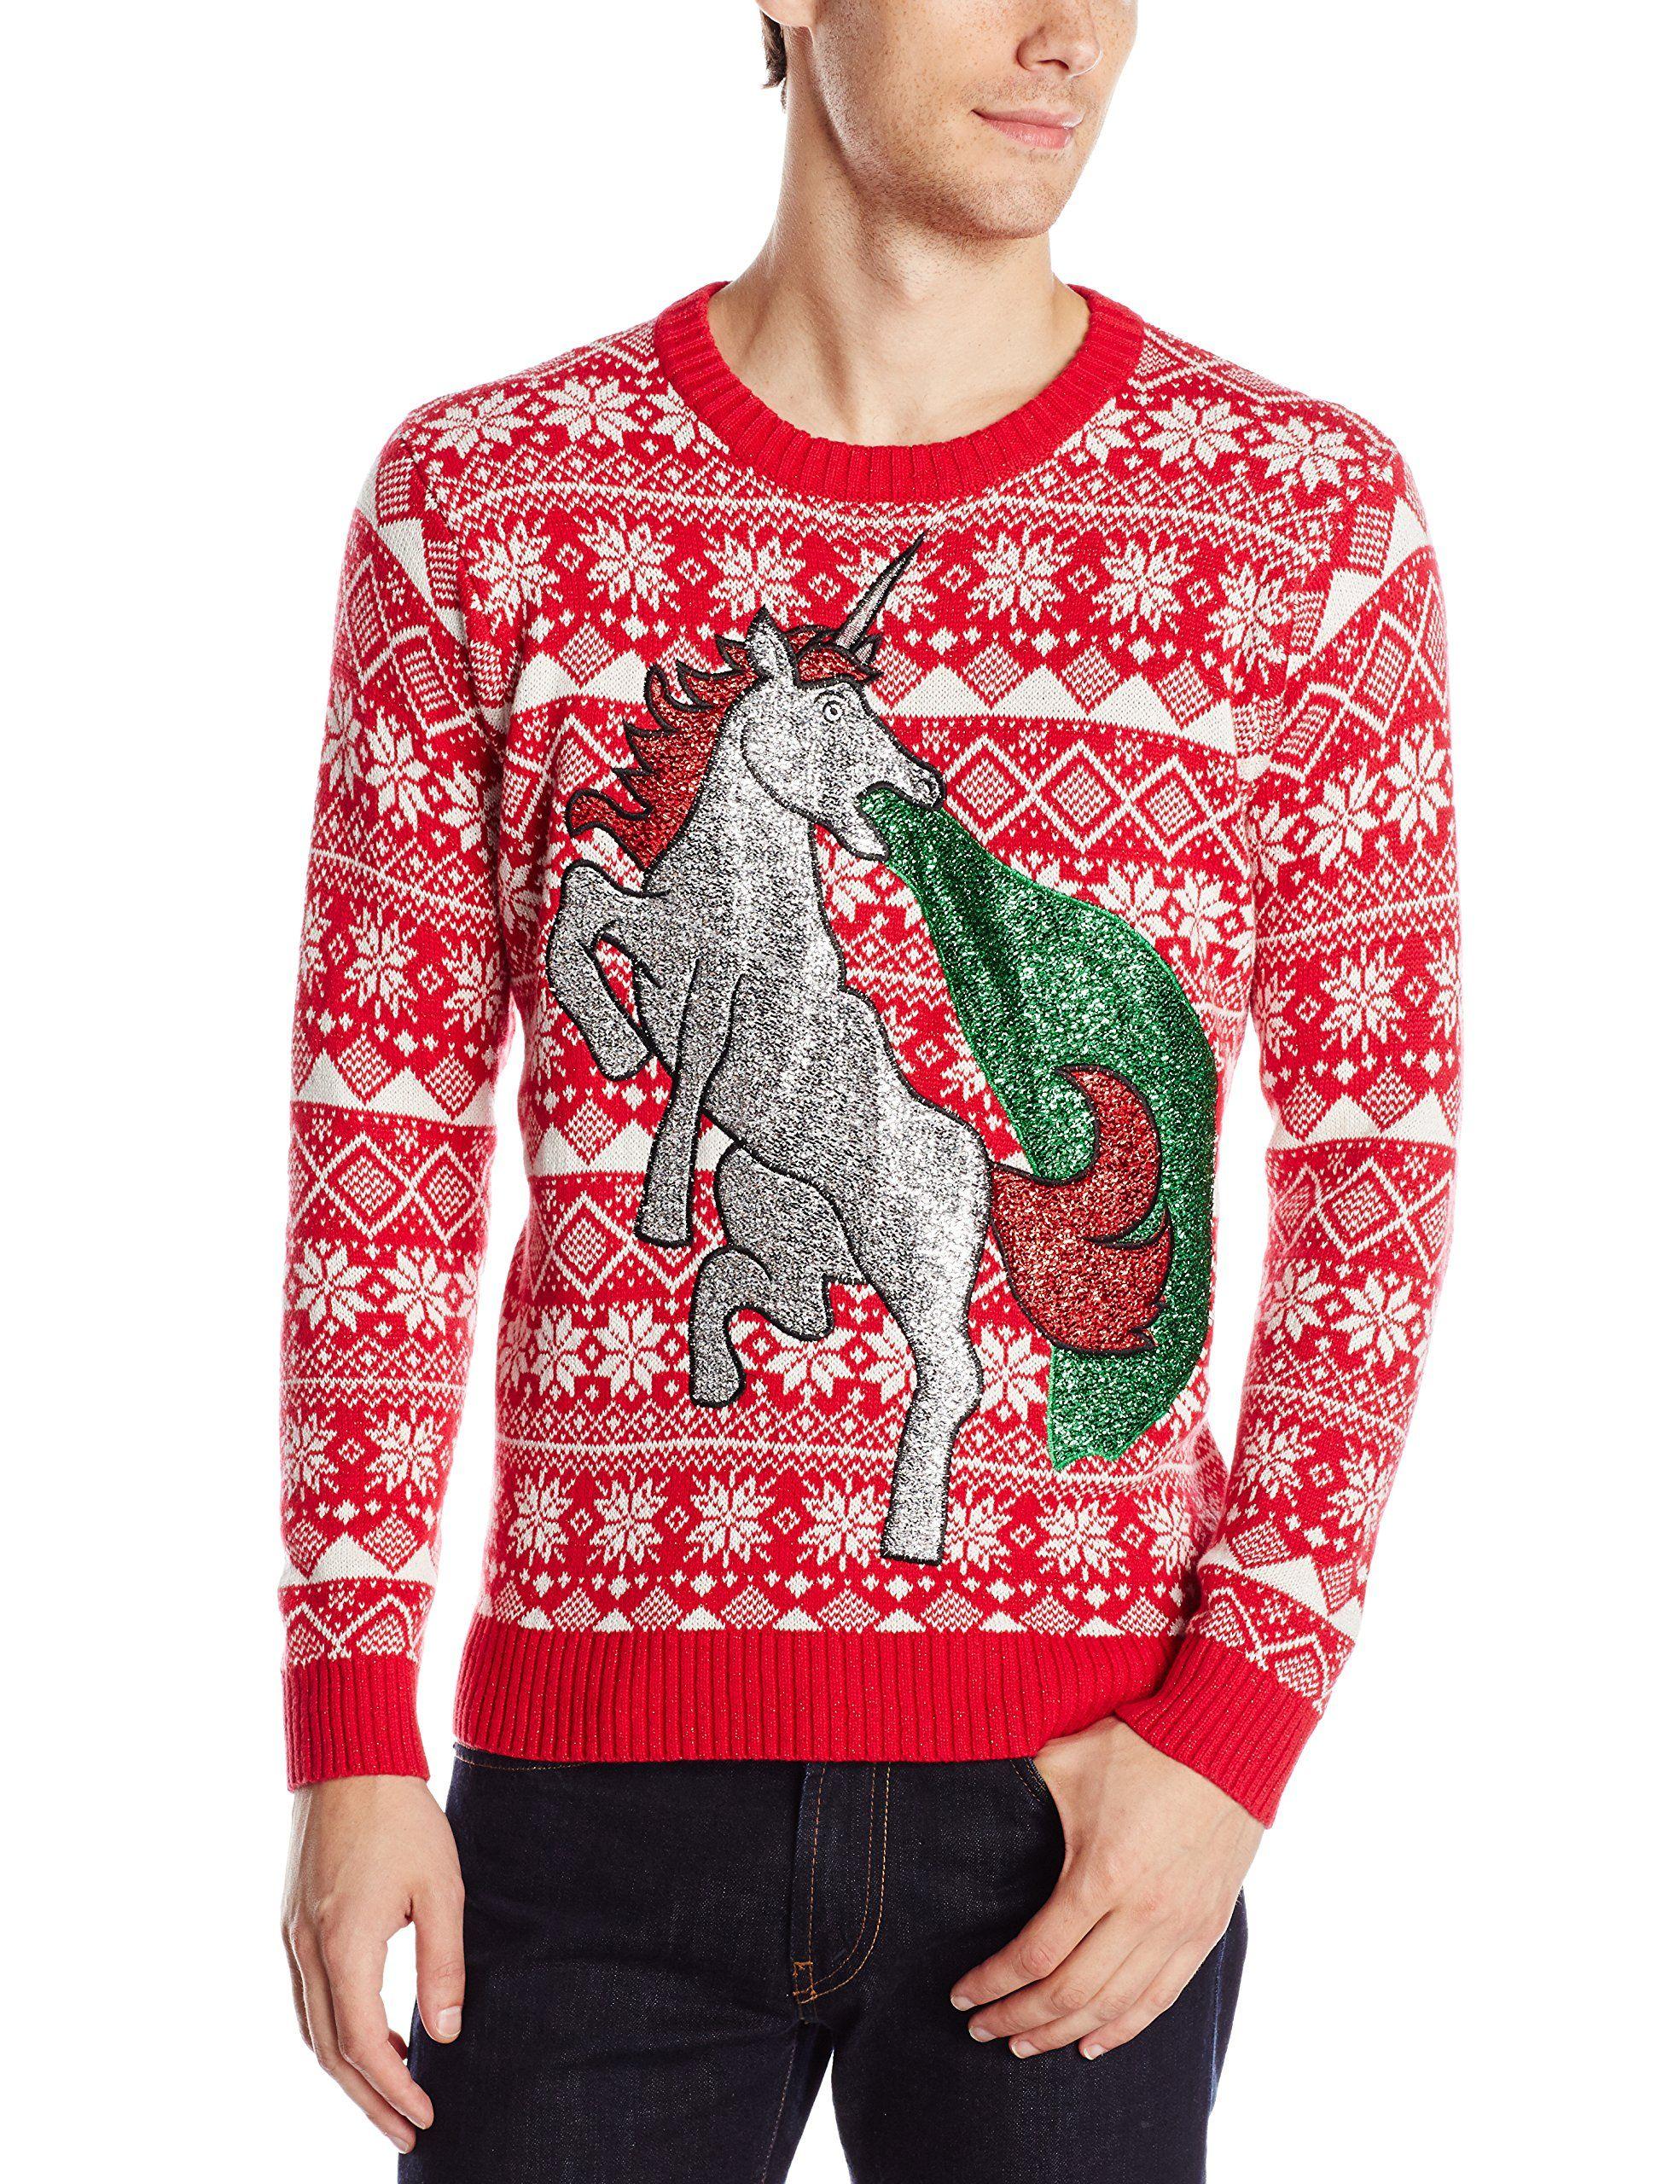 Blizzard Bay Boys Crew Neck Raptors Ugly Christmas Sweater